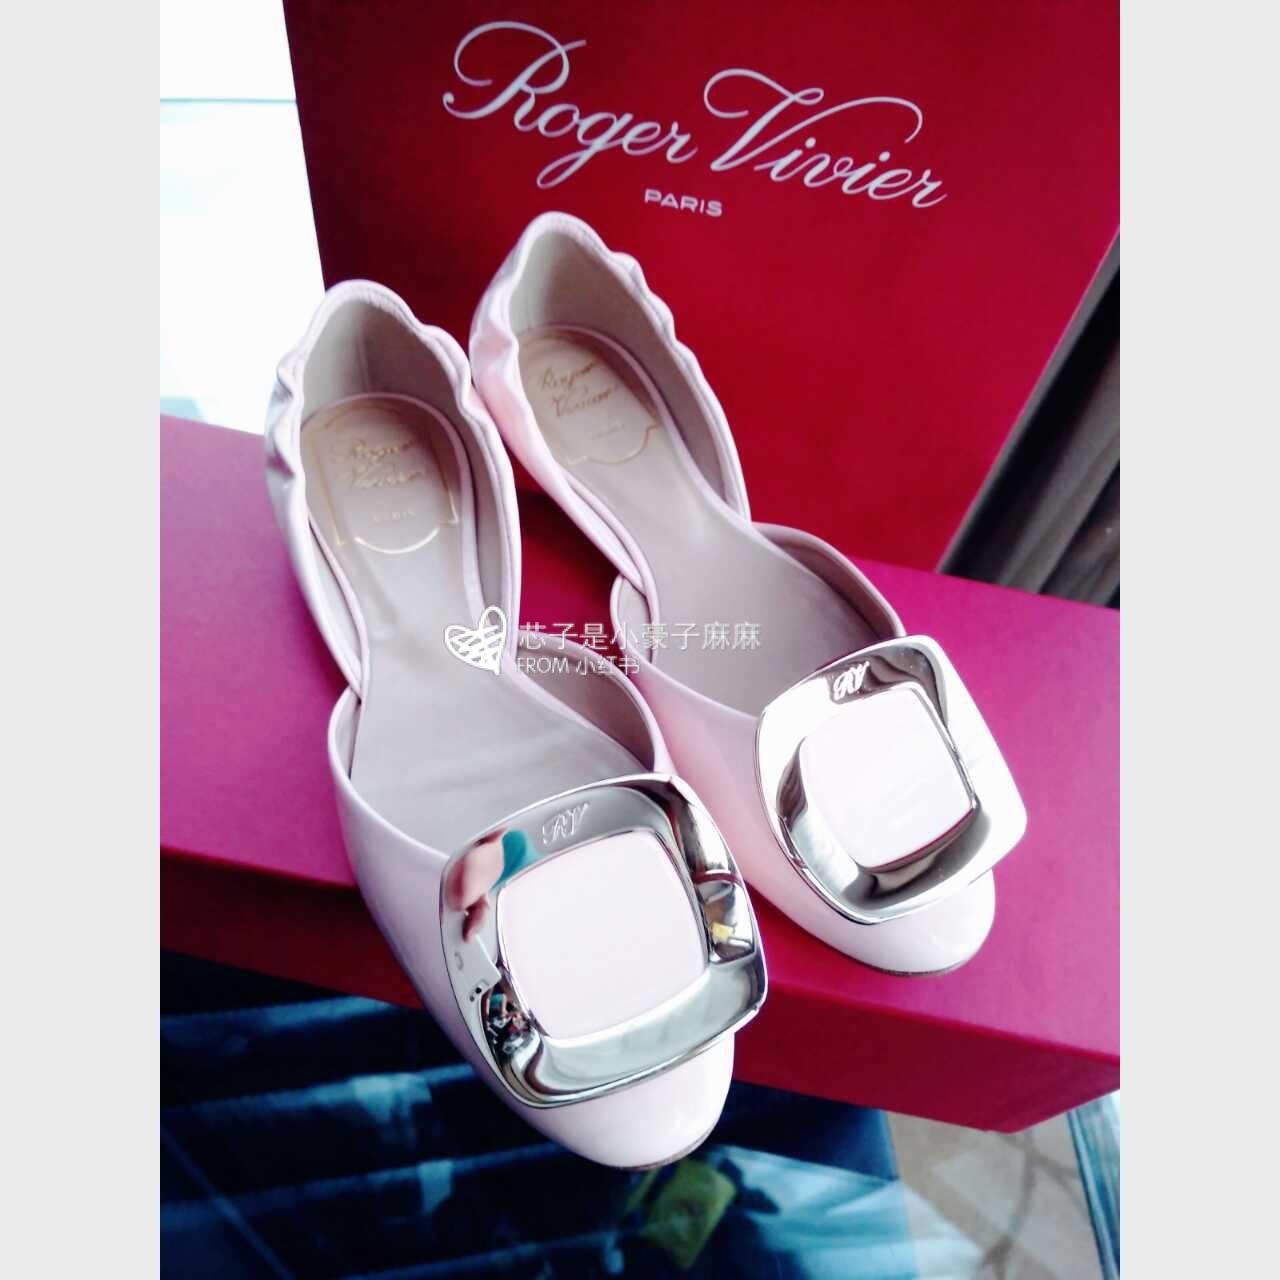 Roger Vivier Shoes Hong Kong 2019 Online Shop   Designer ... 2018年10月25日 -  恭喜美糖喜提代言 5c23e7cecb082